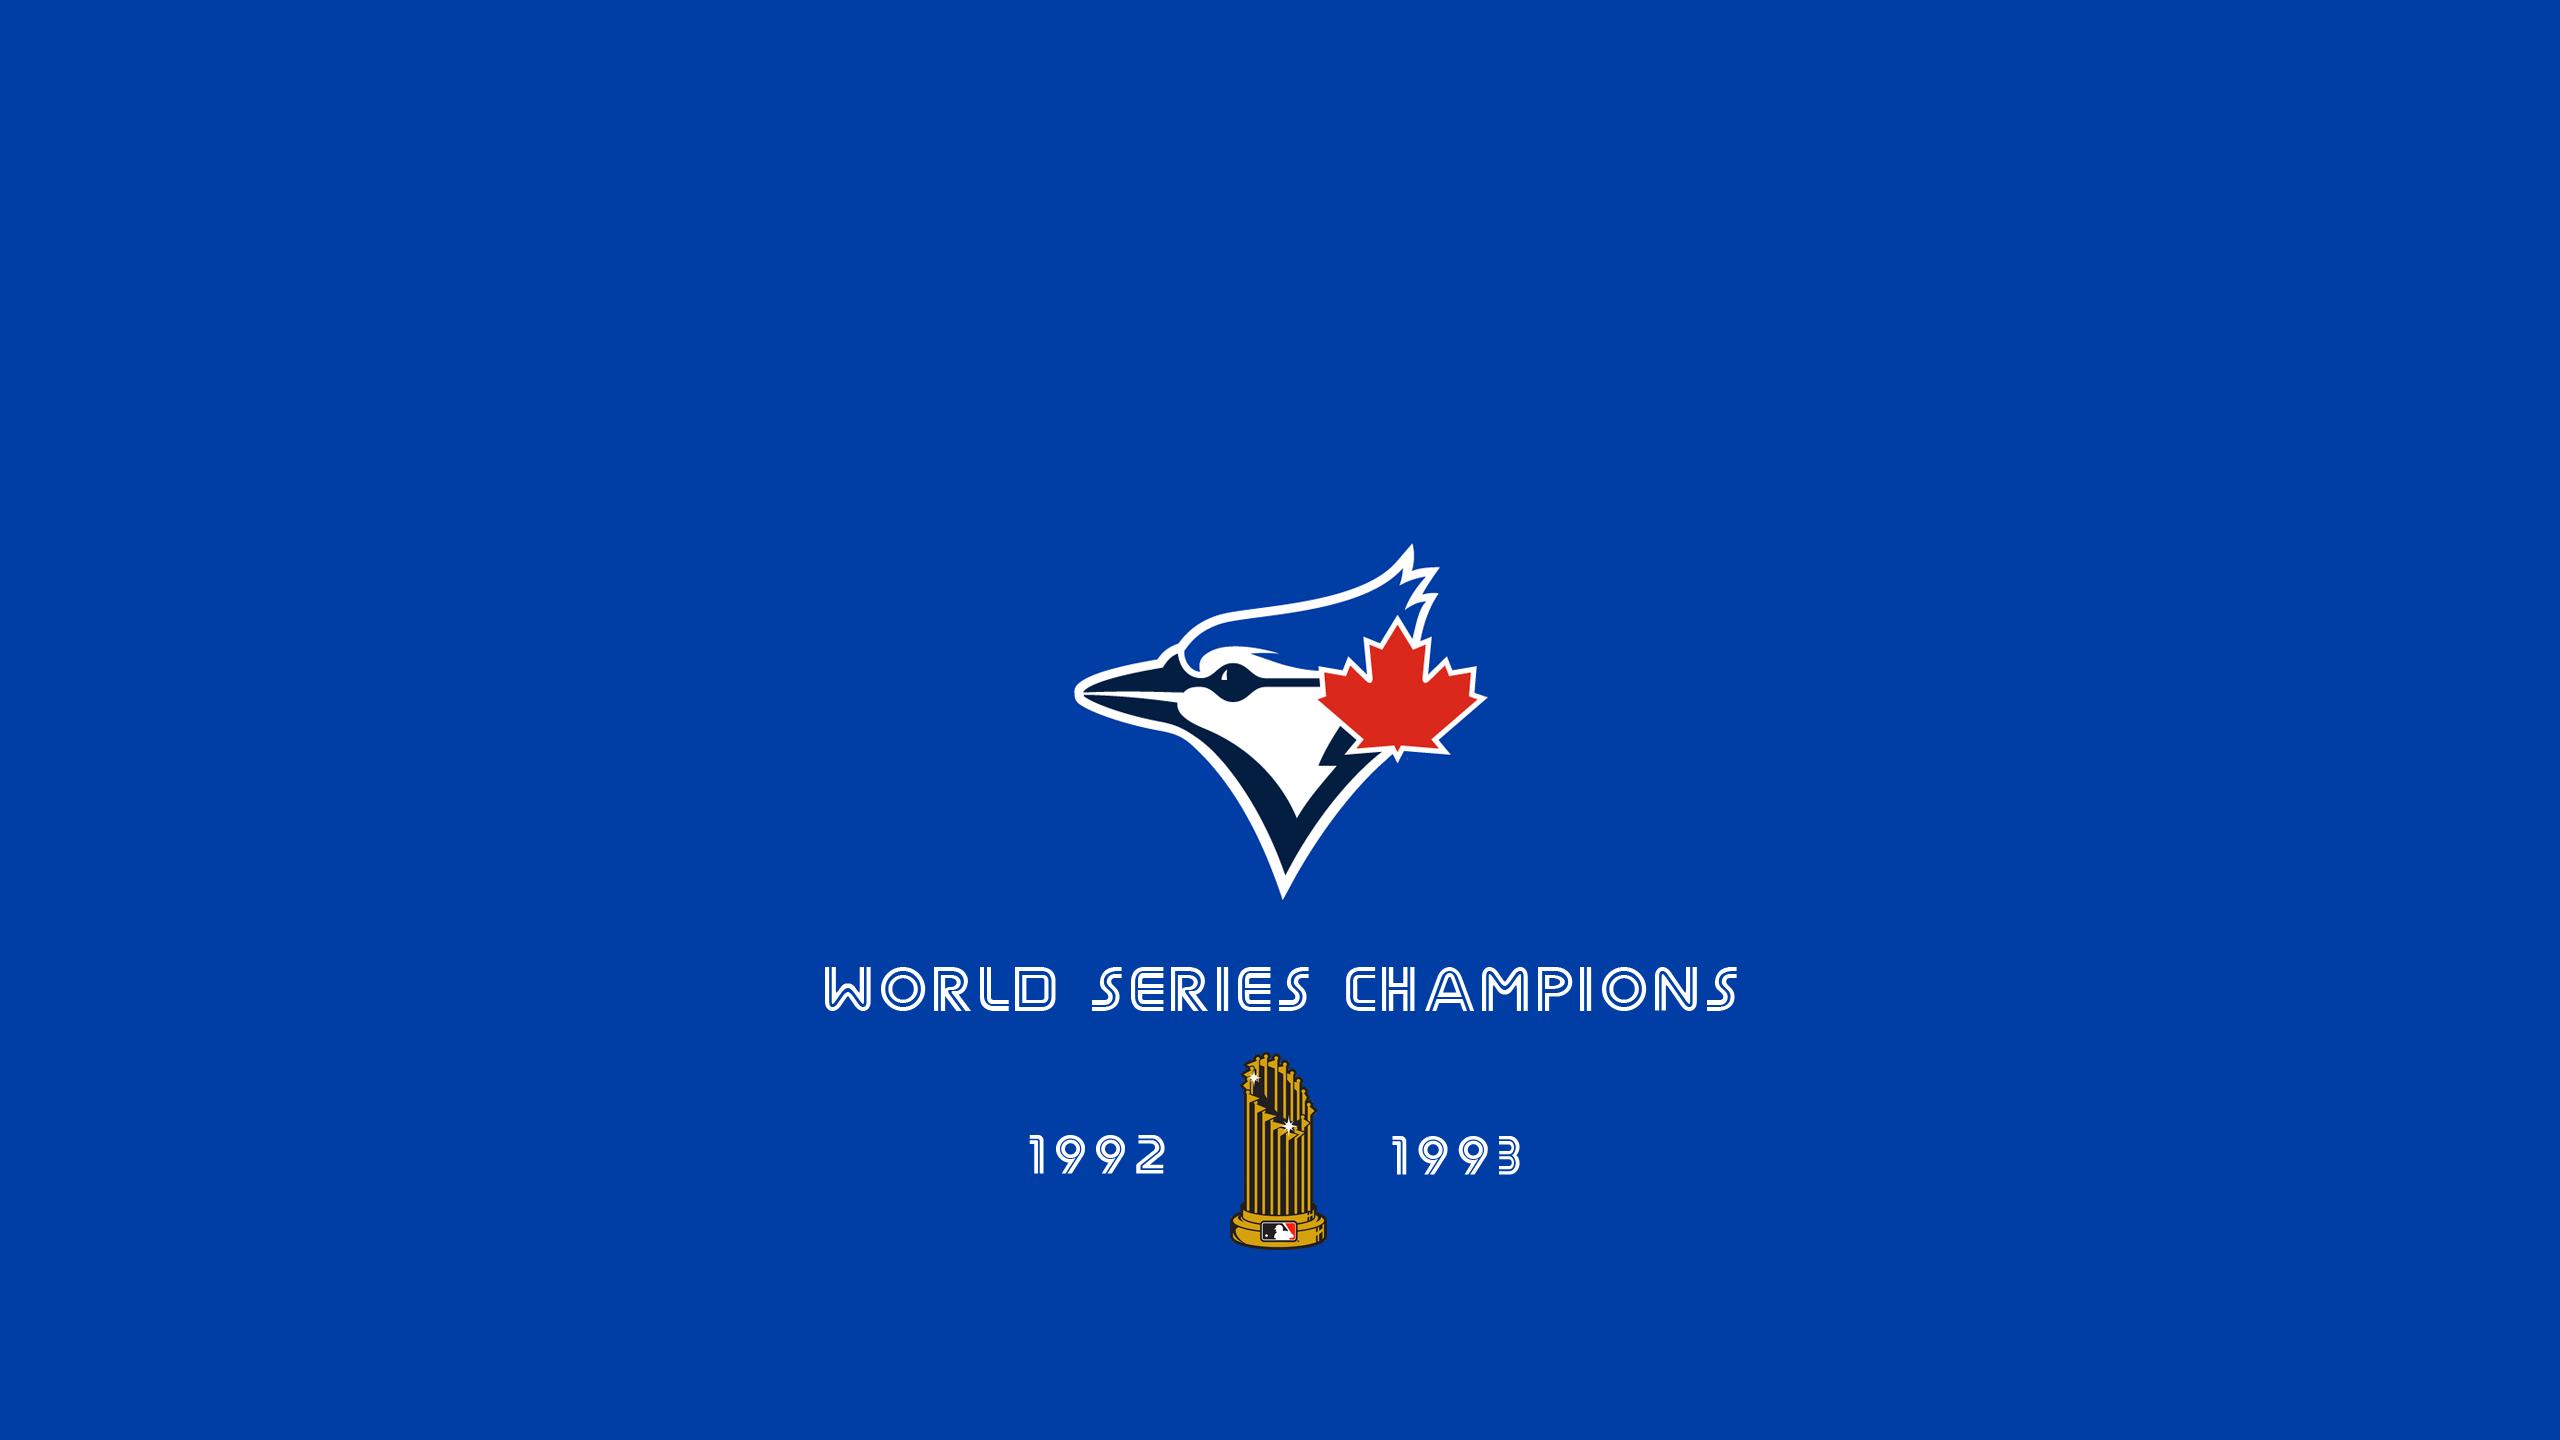 Toronto Blue Jays - World Series Champs